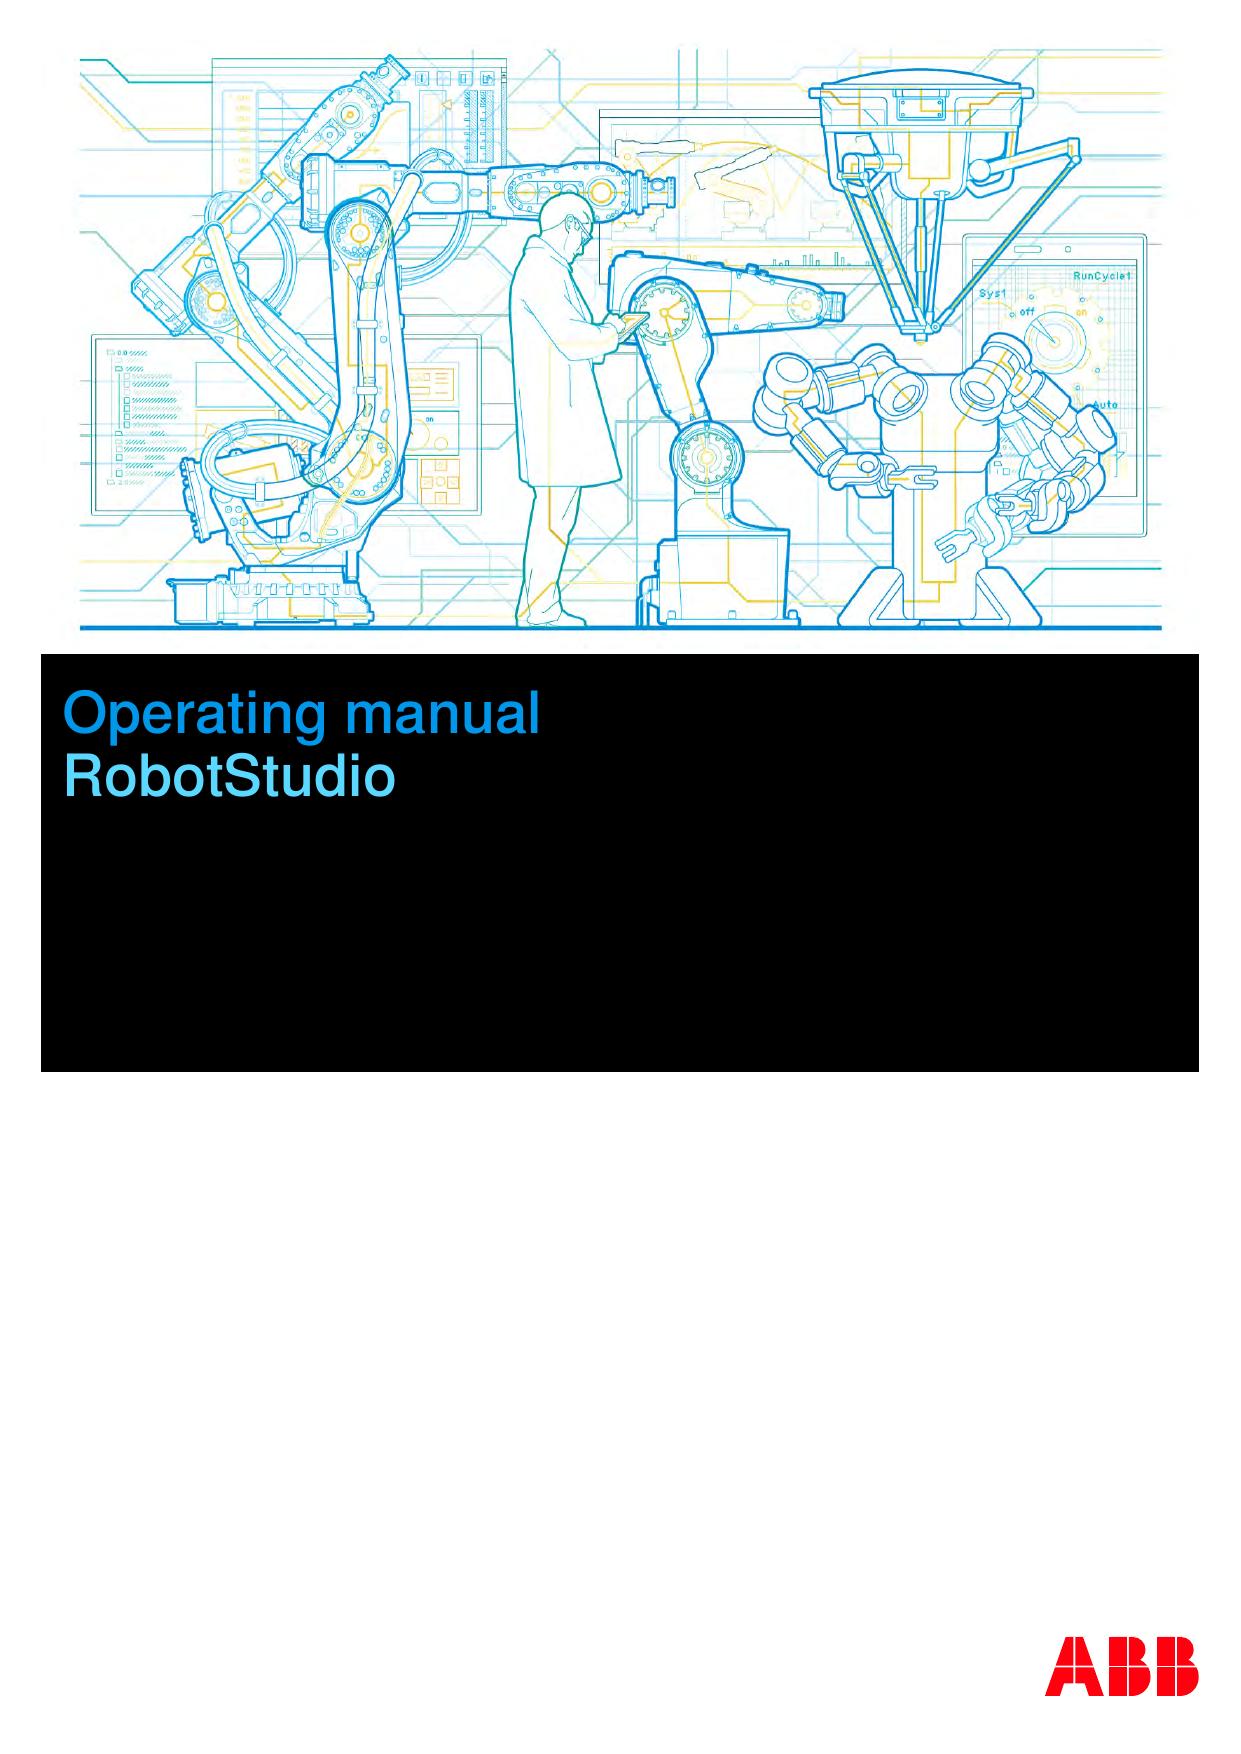 Operating manual - RobotStudio | manualzz com